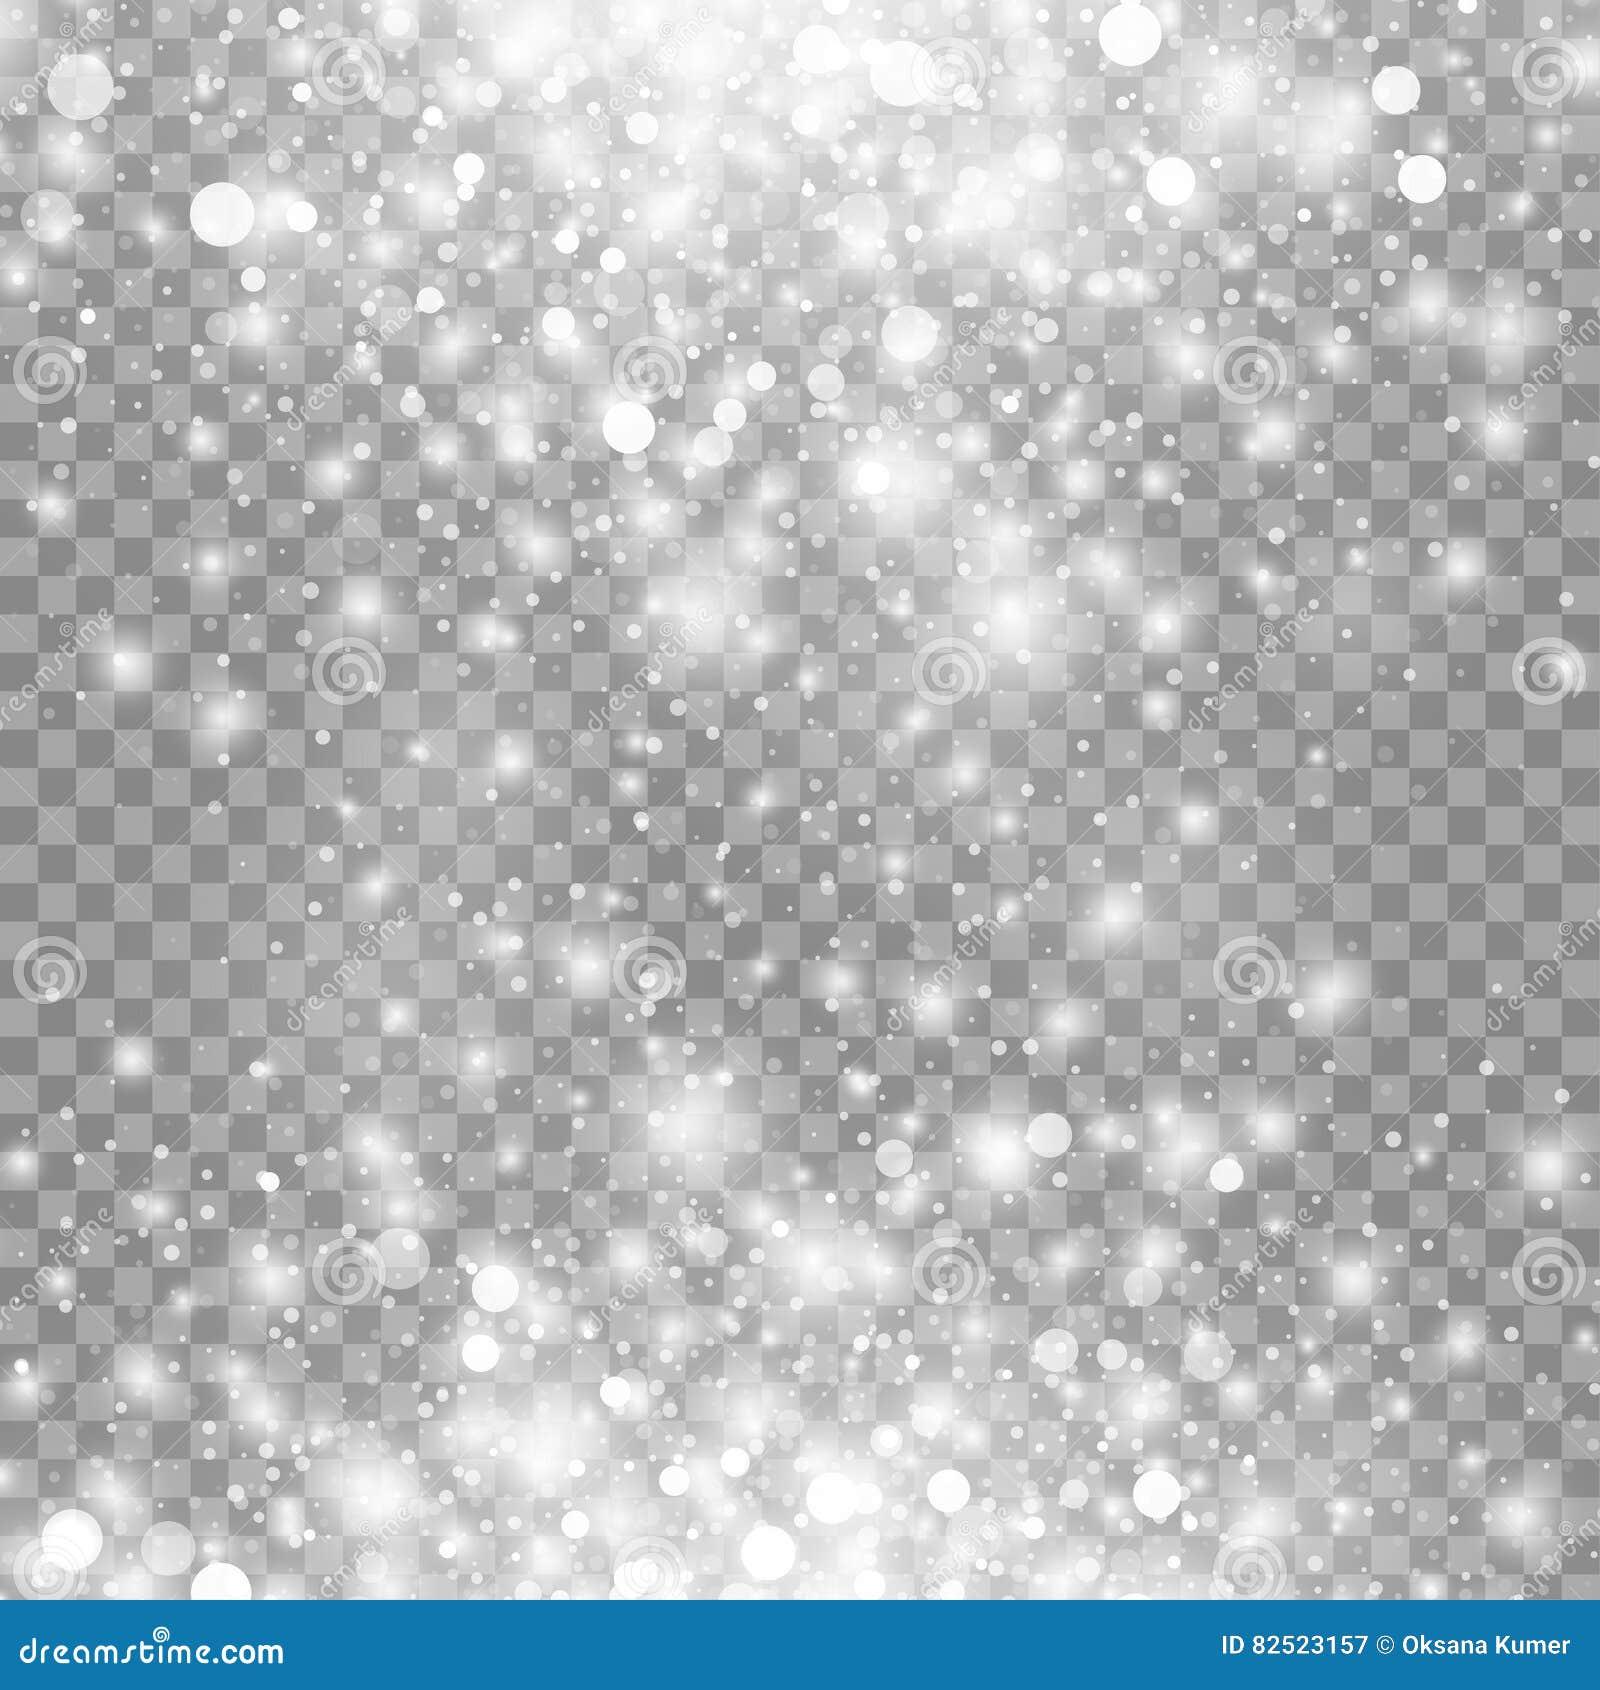 Vector o efeito da luz mágico do fulgor branco isolado no fundo transparente